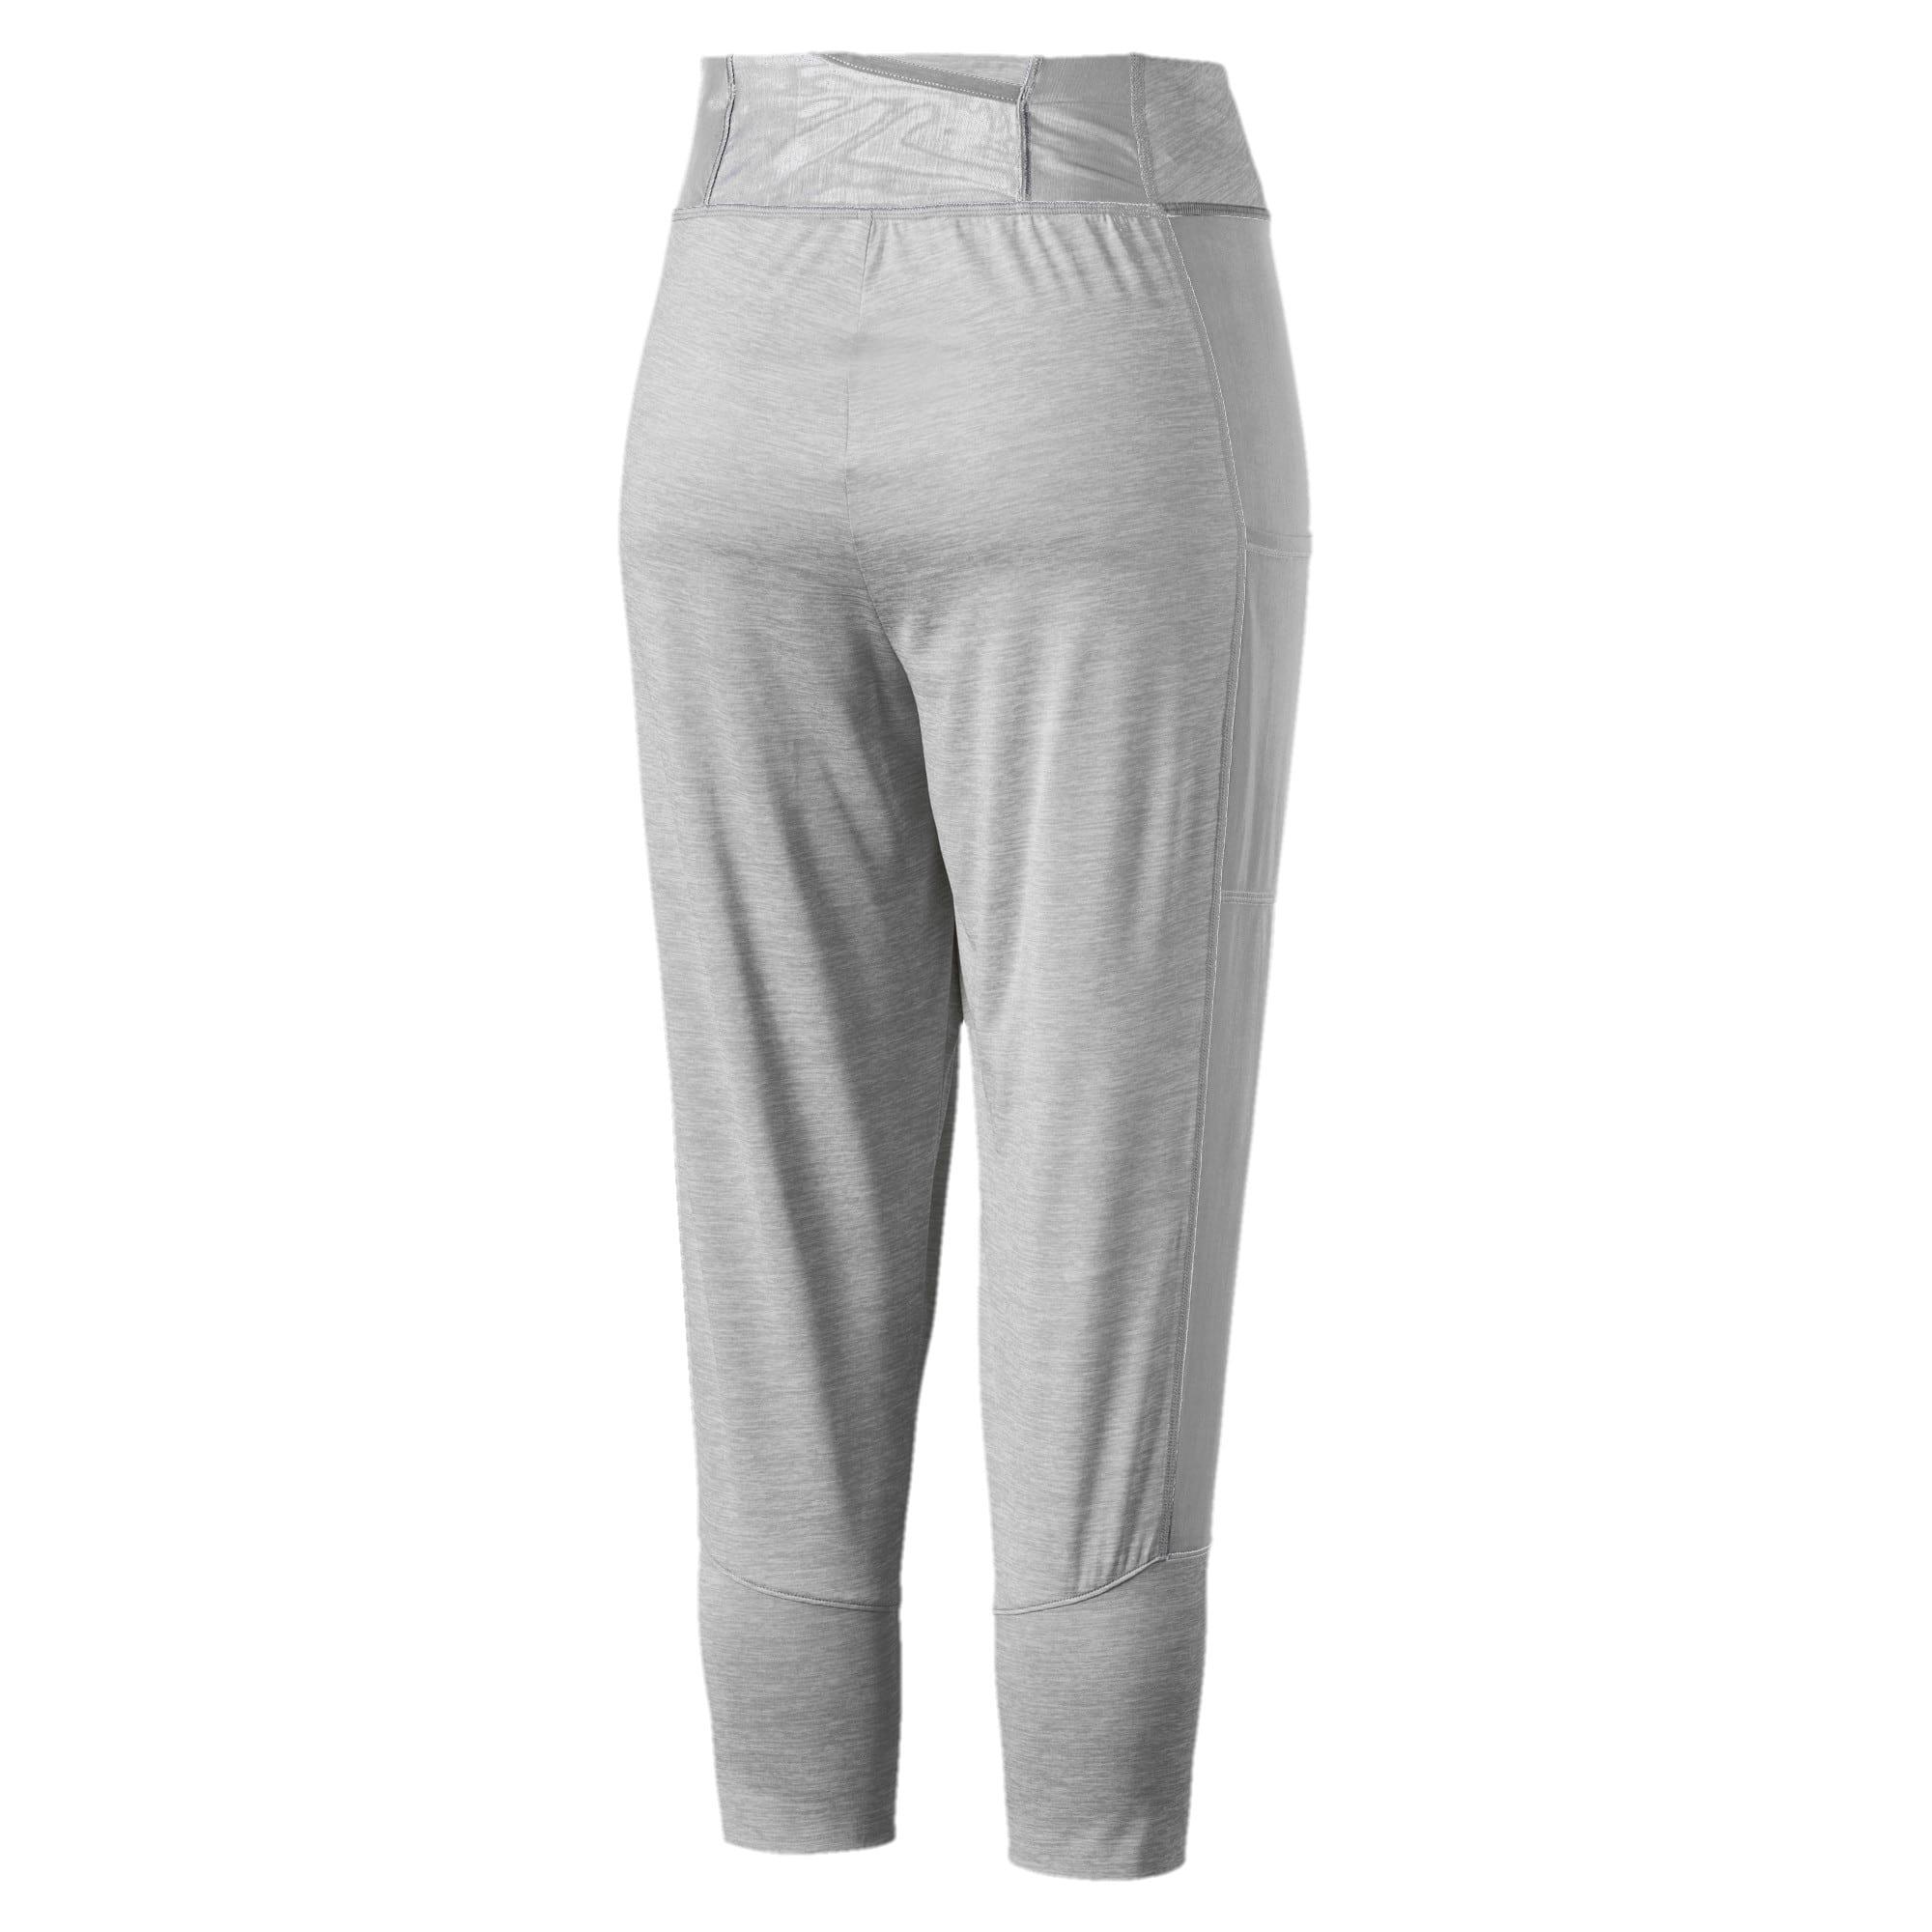 Thumbnail 5 of Knockout Woven Women's 3/4 Pants, Light Gray Heather, medium